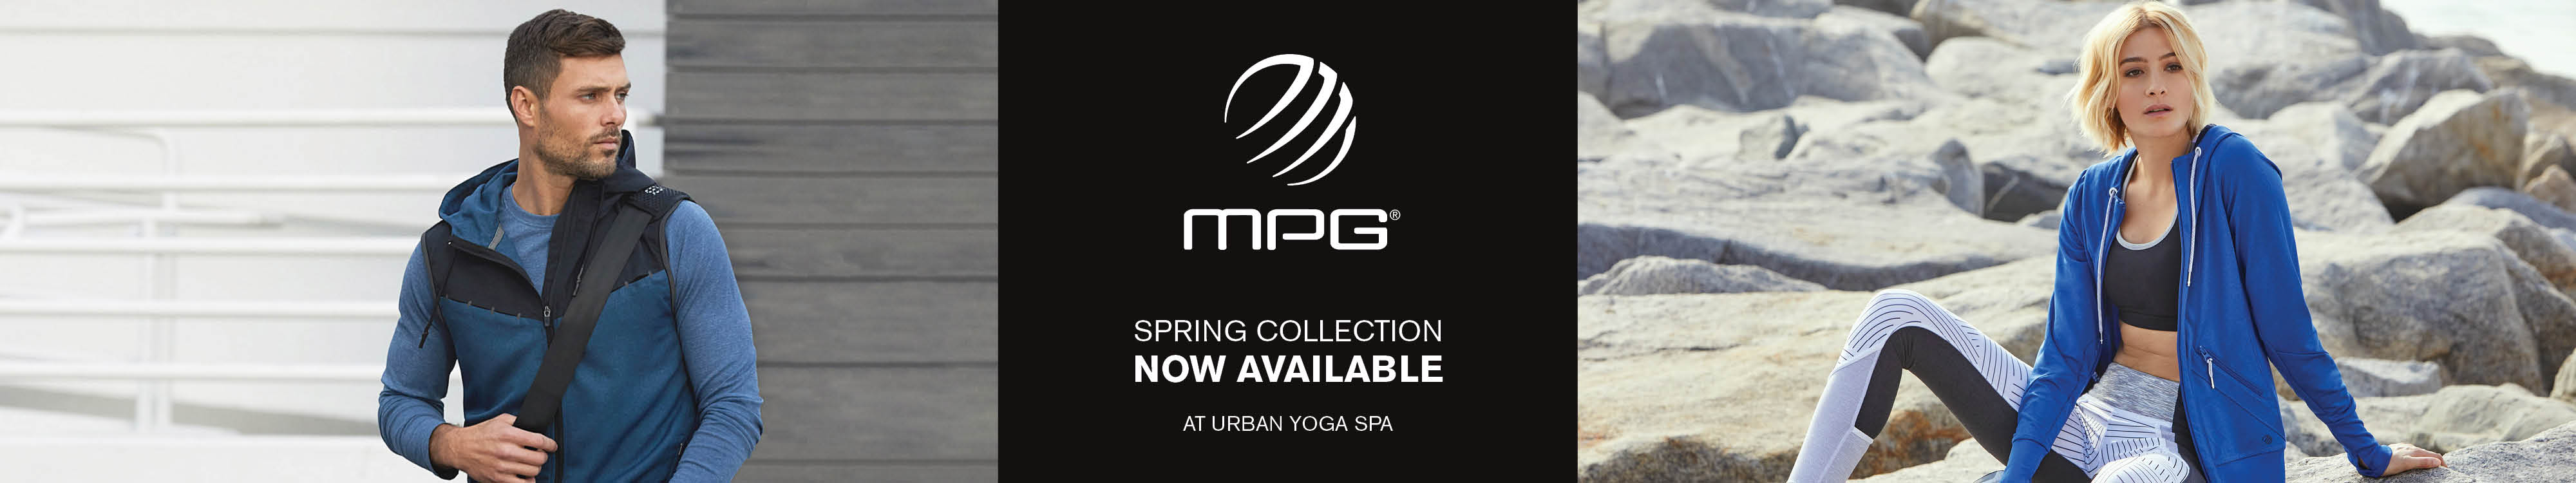 MPG-UYS-Web-Banner-1920x360-1